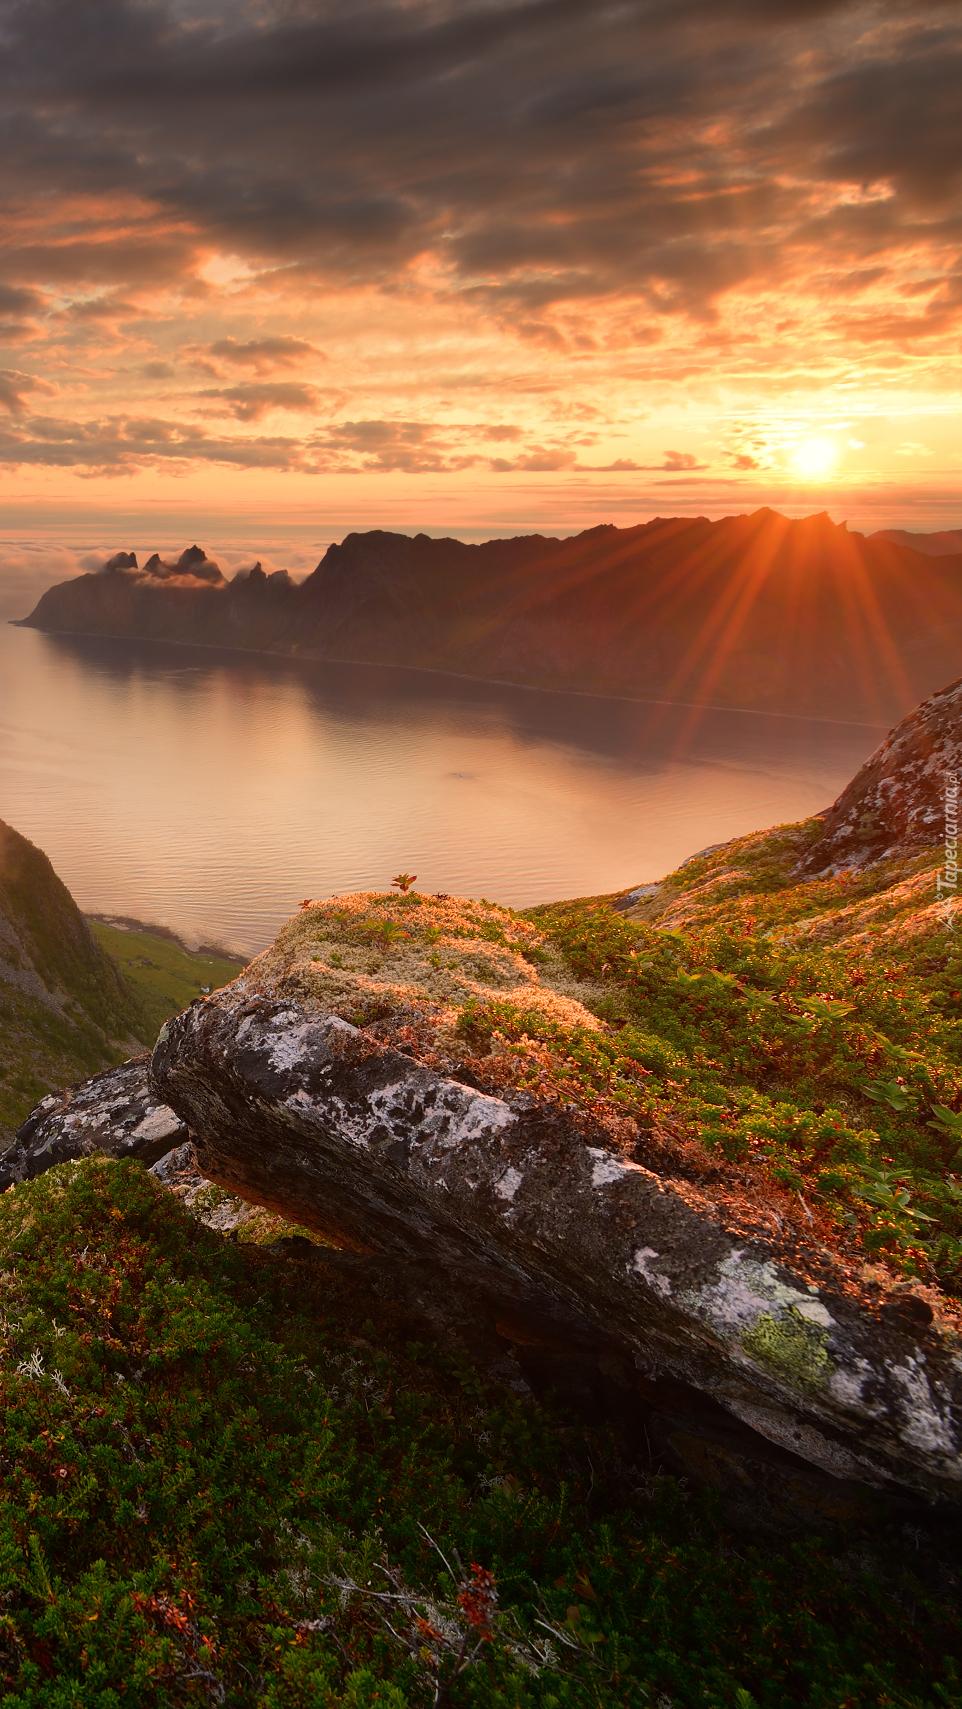 Skały i góra Husfjellet nad morzem Norweskim